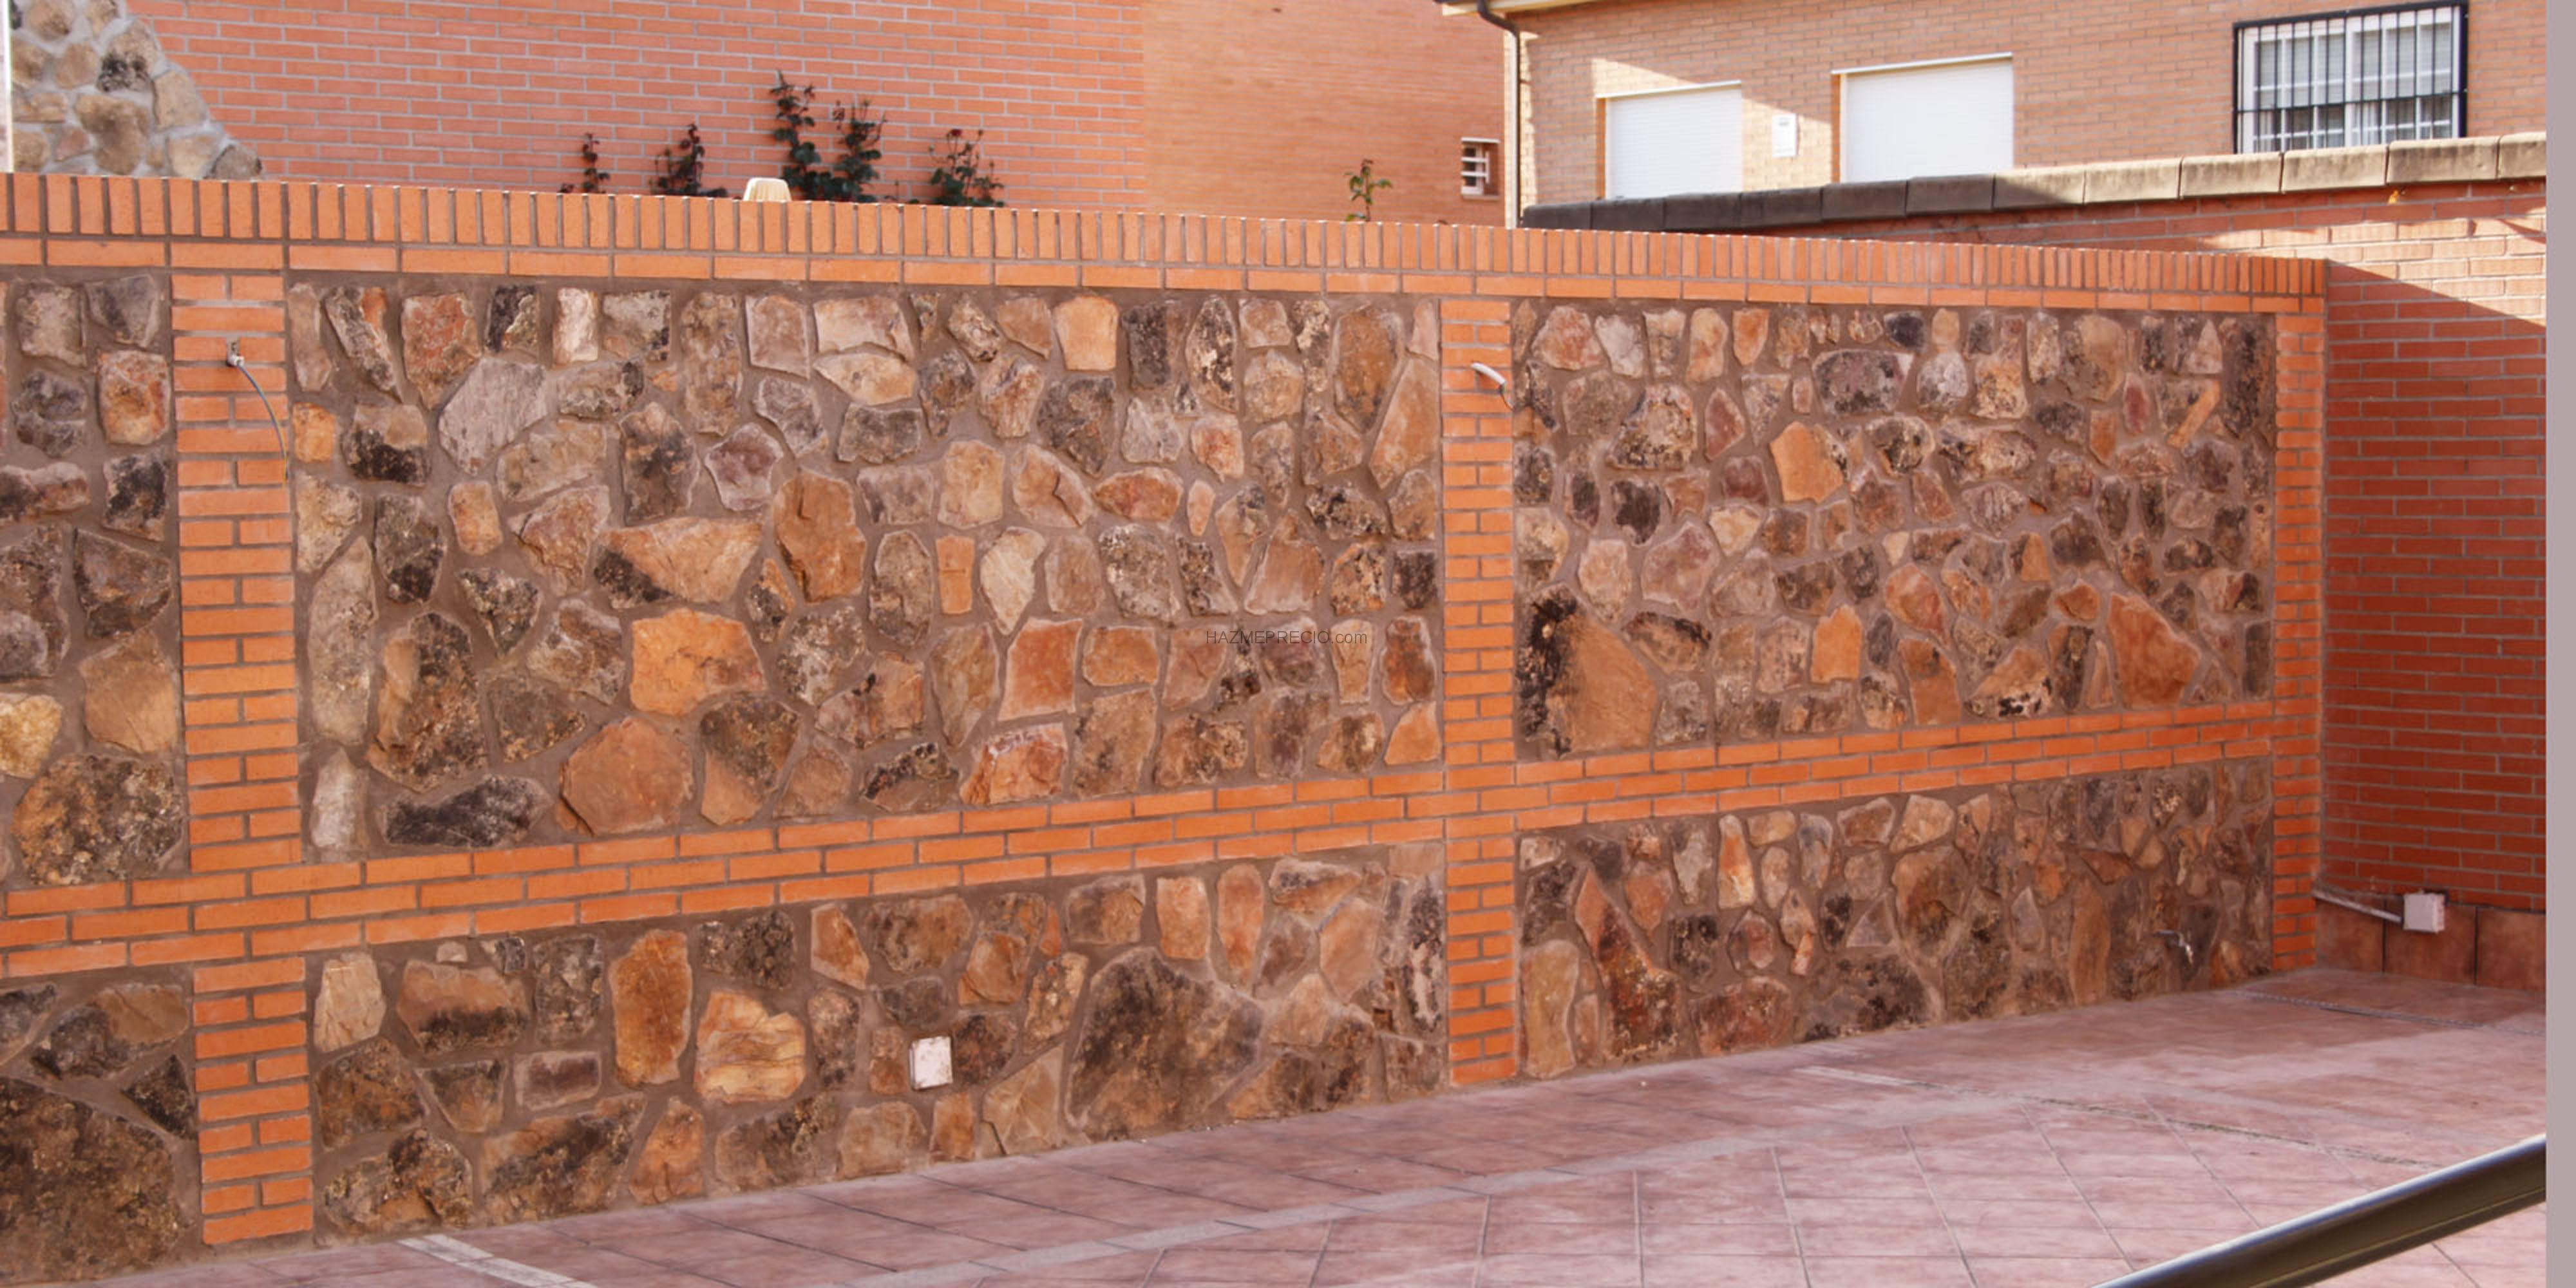 Pavimentospro 28804 alcal de henares madrid - Ladrillo visto precio ...